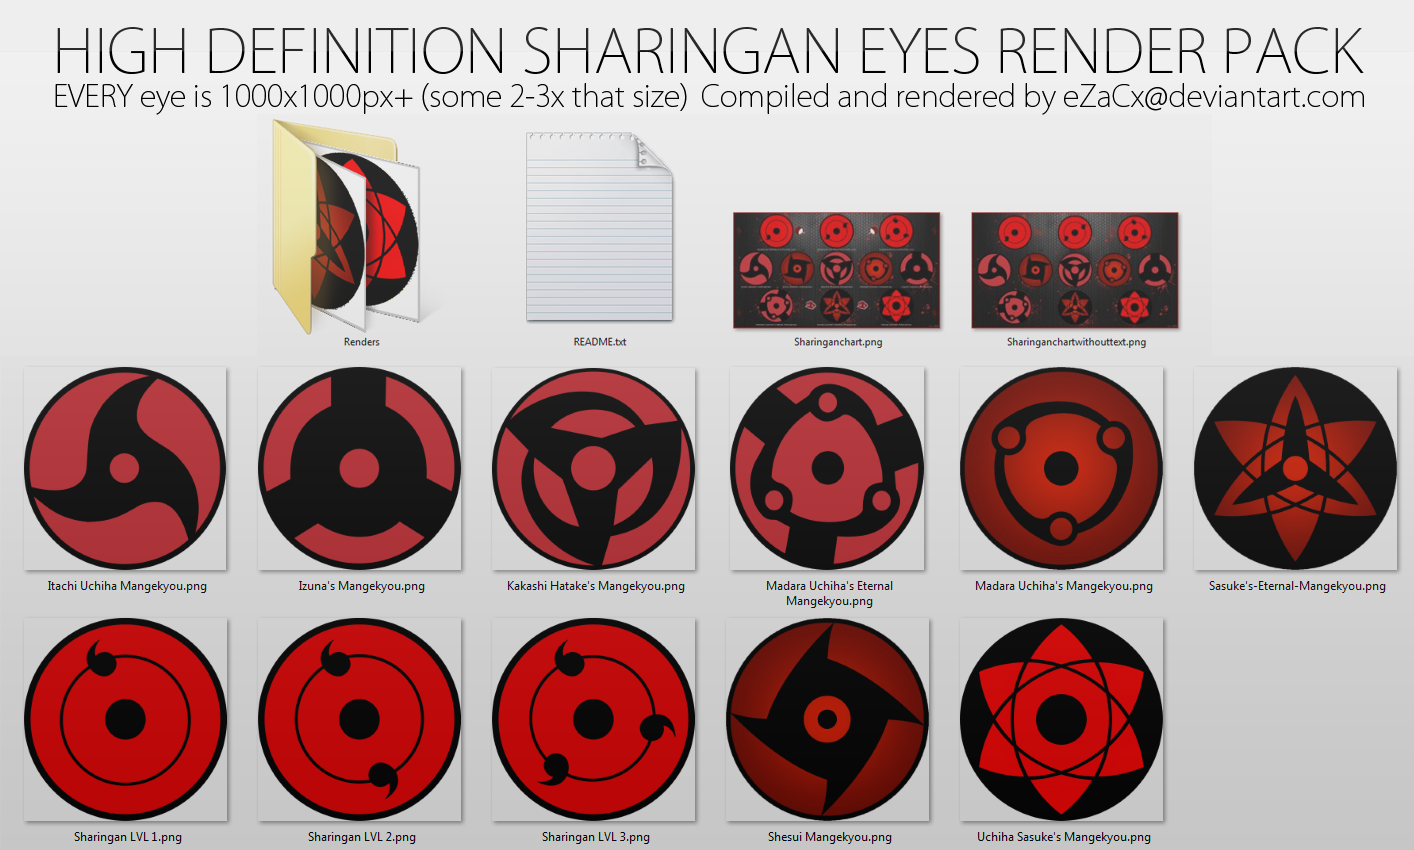 Hd Sharingan Eyes Render Pack By Ezacx On Deviantart